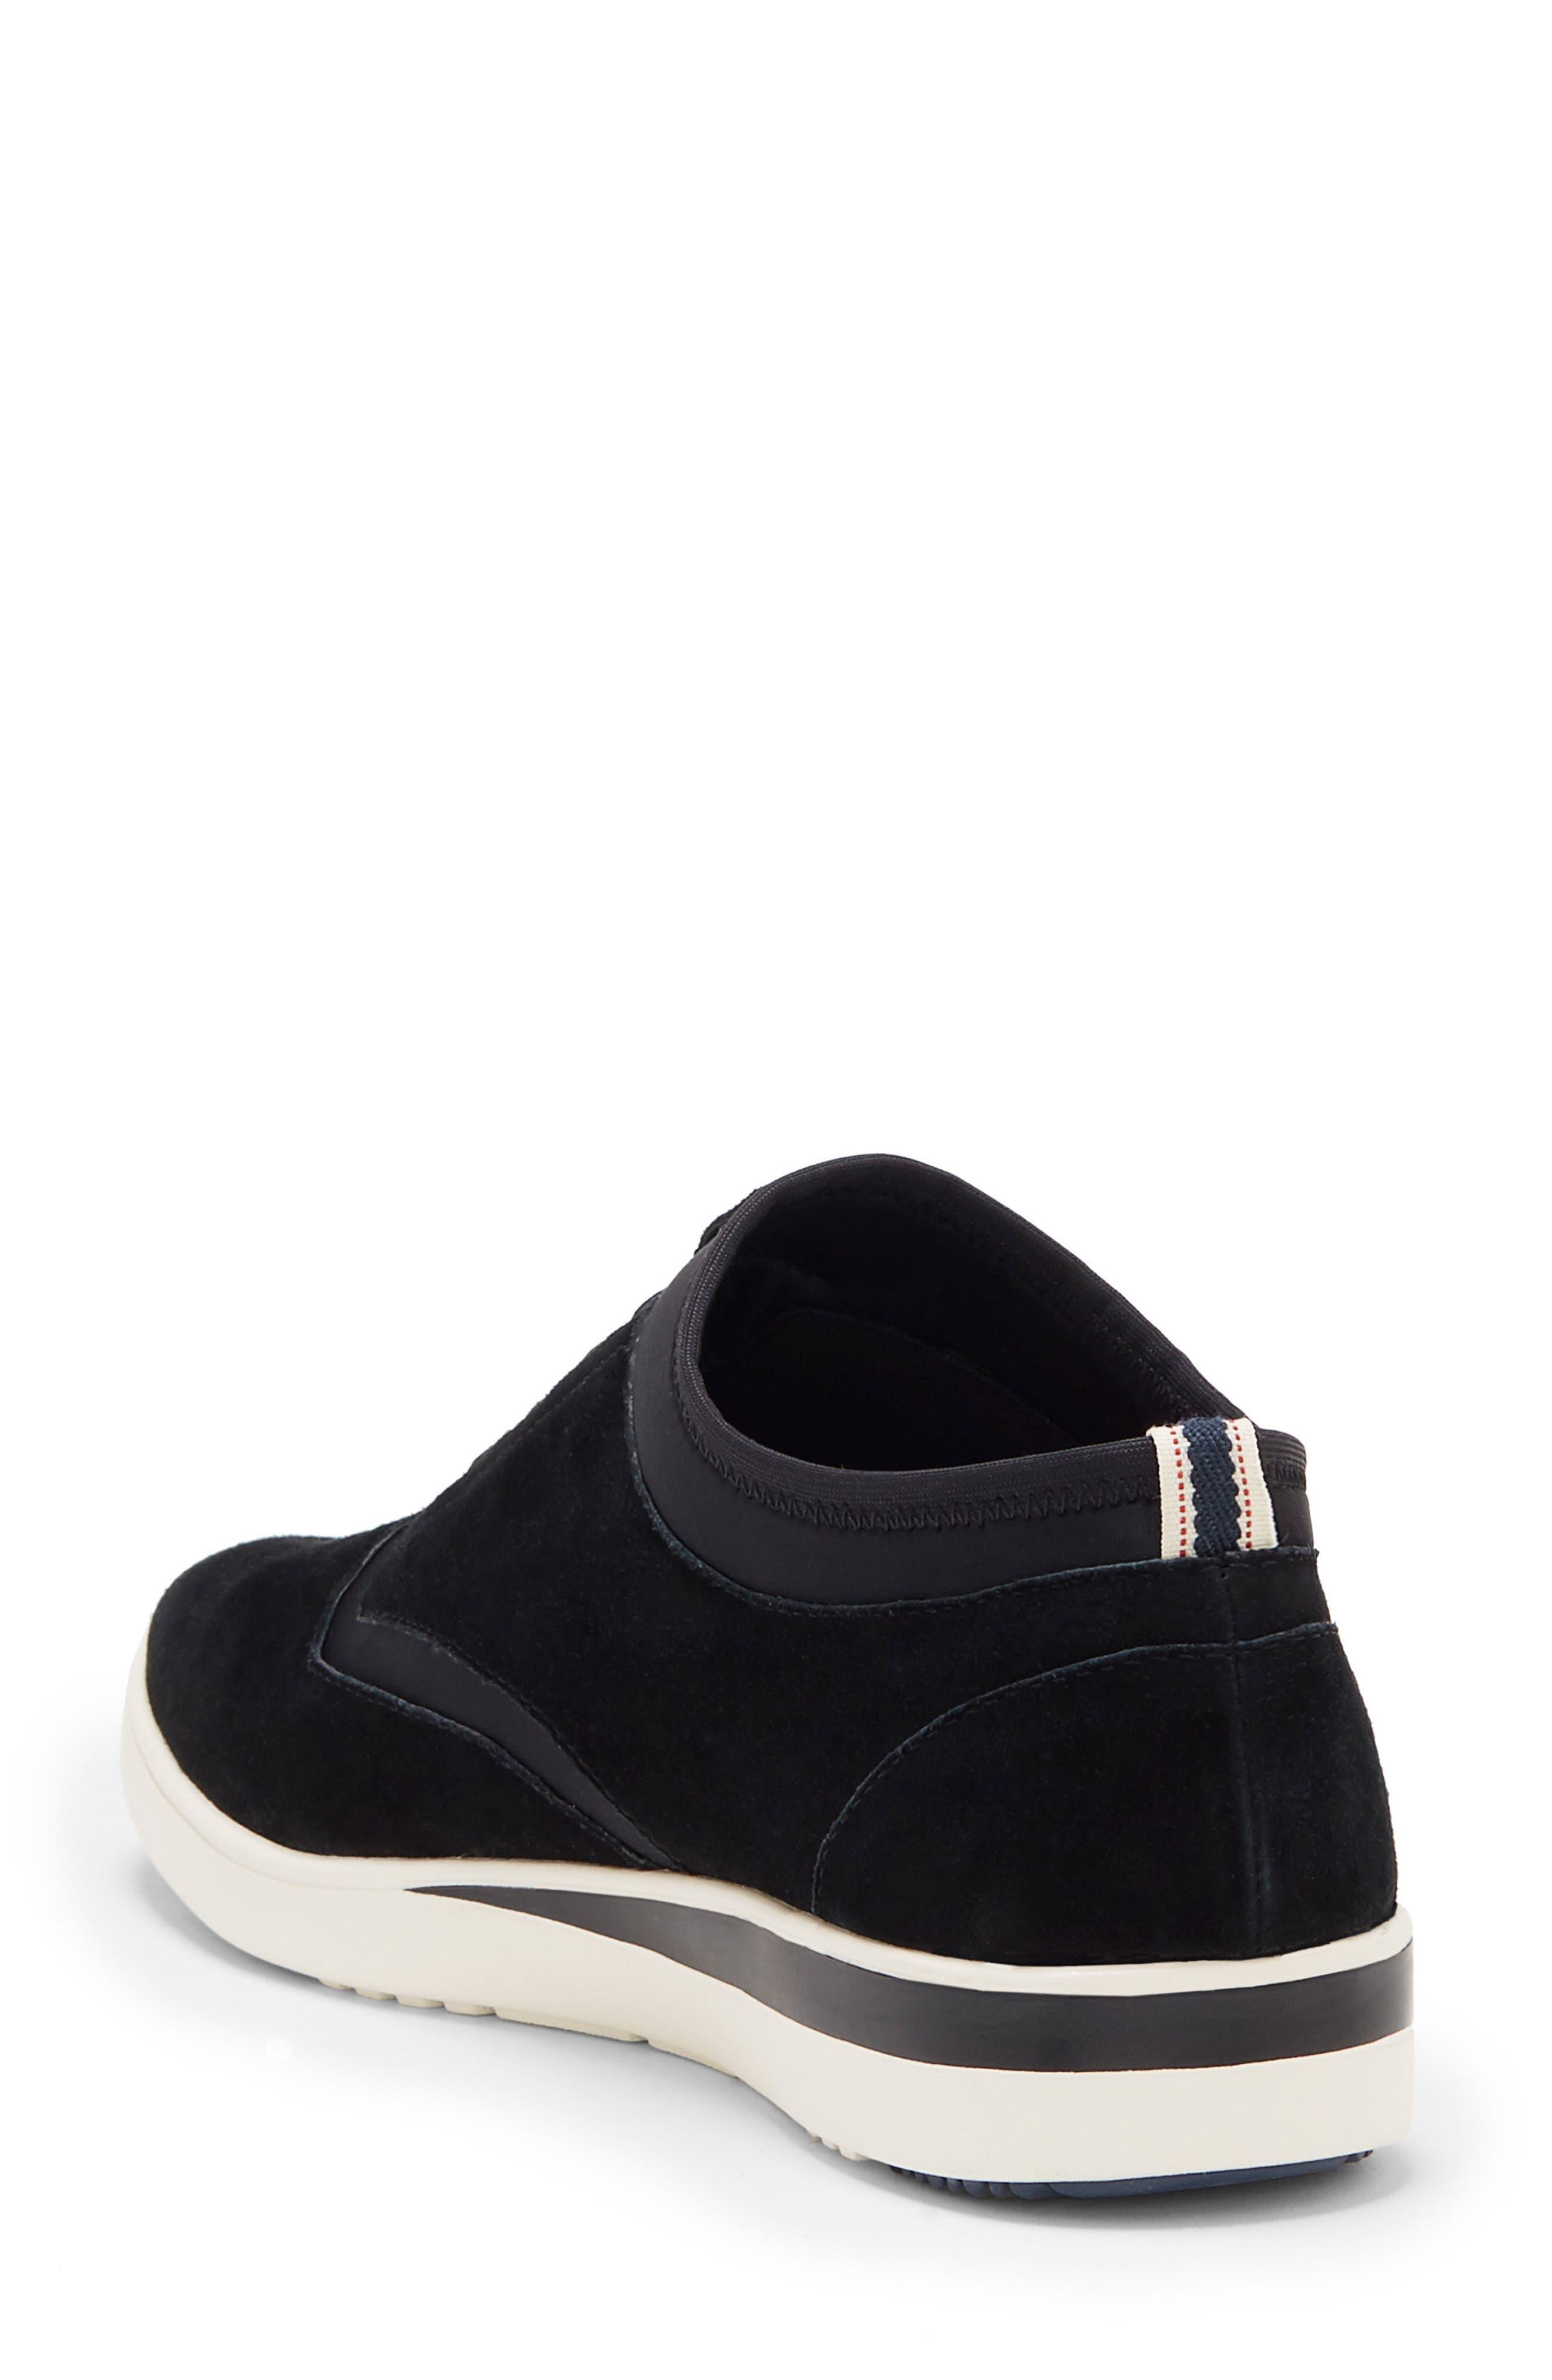 Atala Sneaker,                             Alternate thumbnail 2, color,                             002